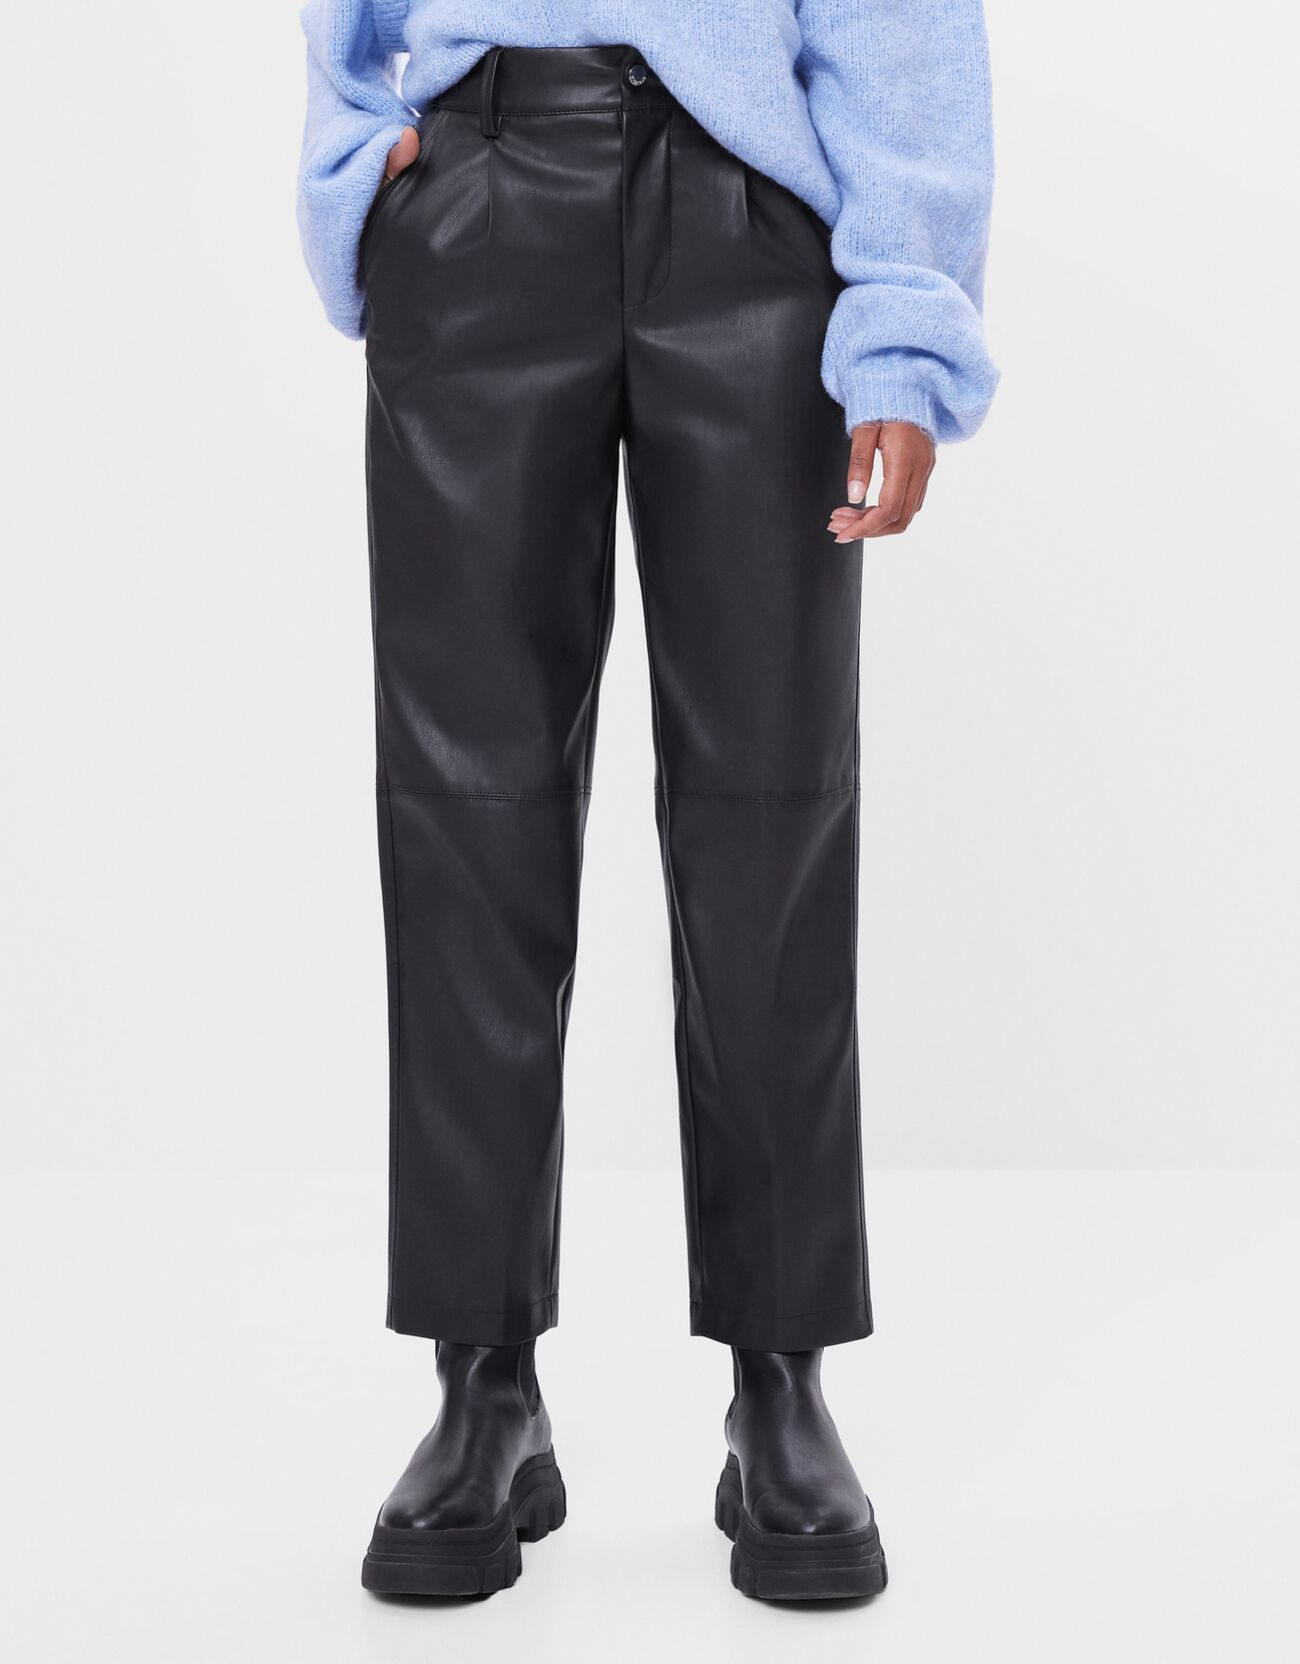 Straightforward synthetic leather pants